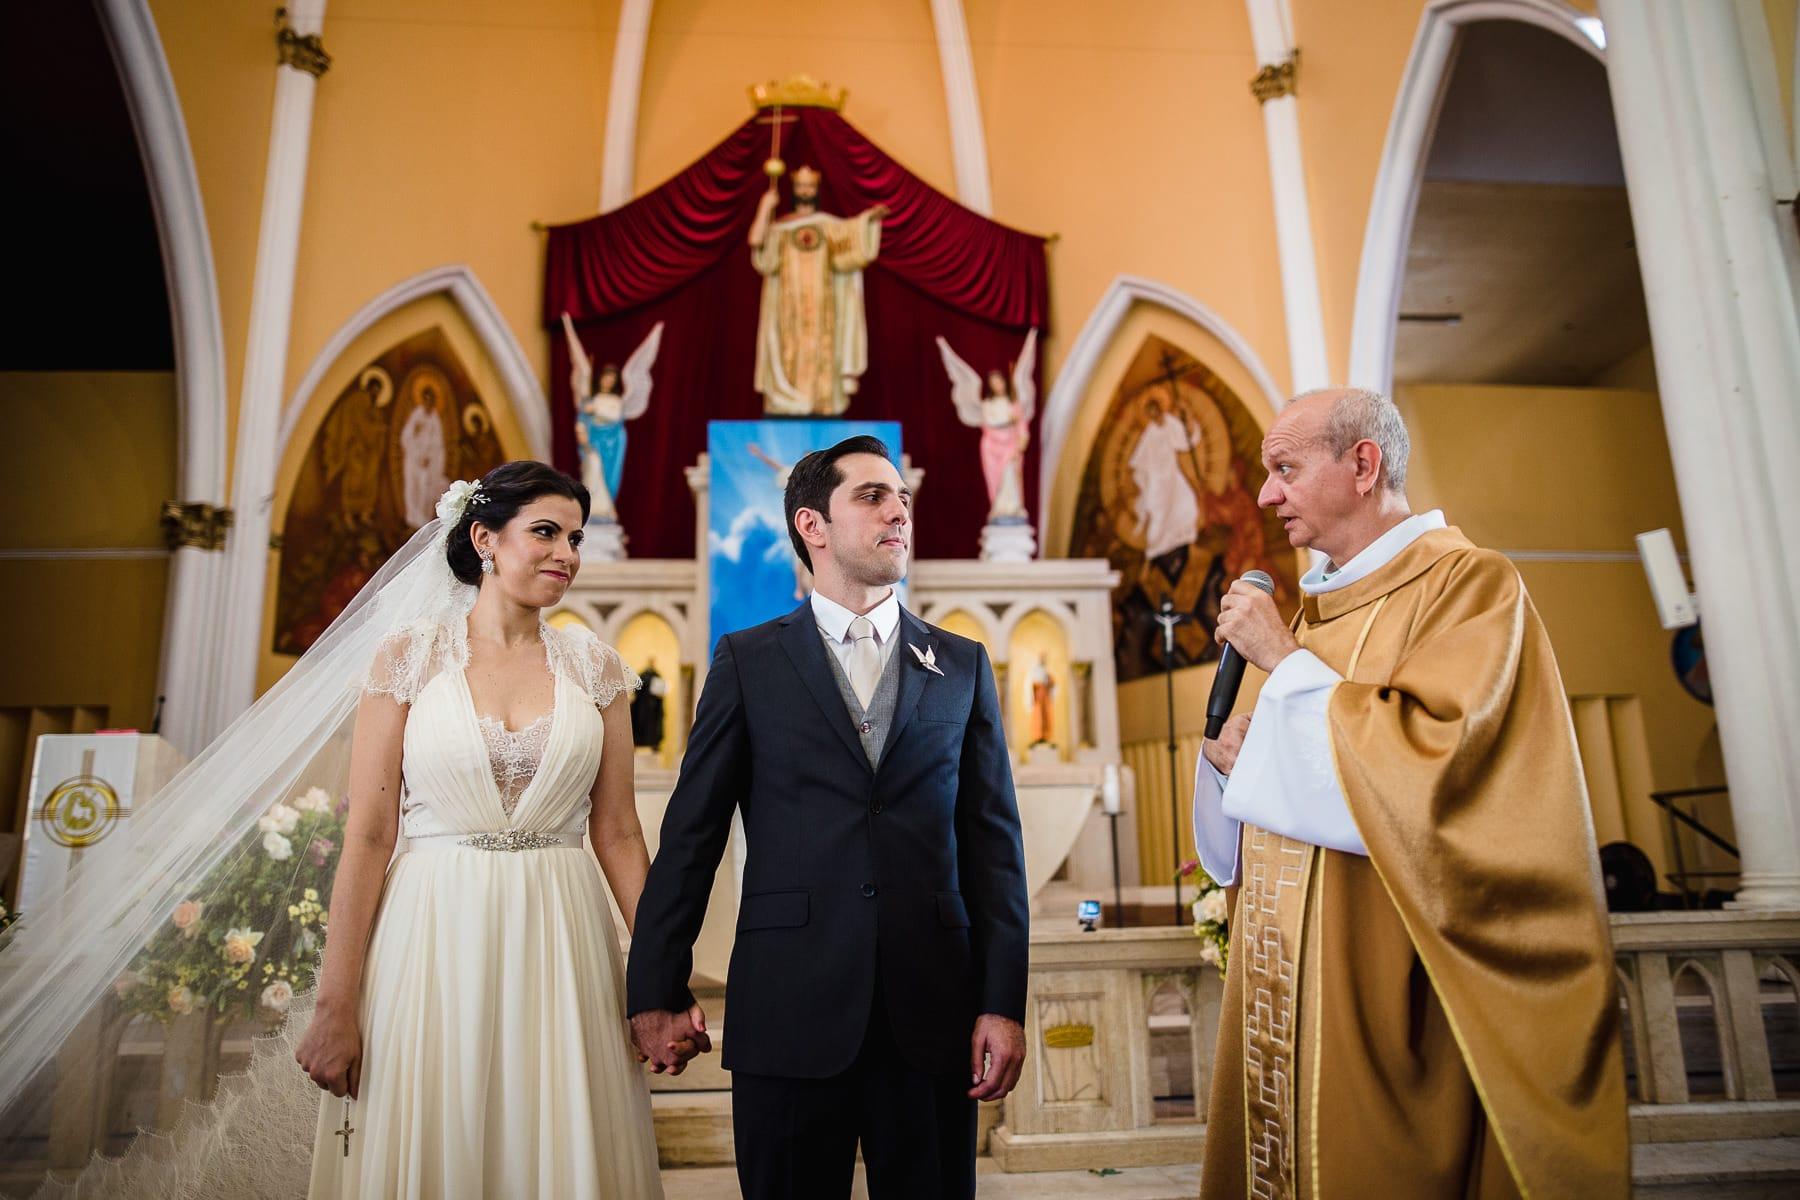 casamento-igreja-do-cristo-rei-fortaleza-40